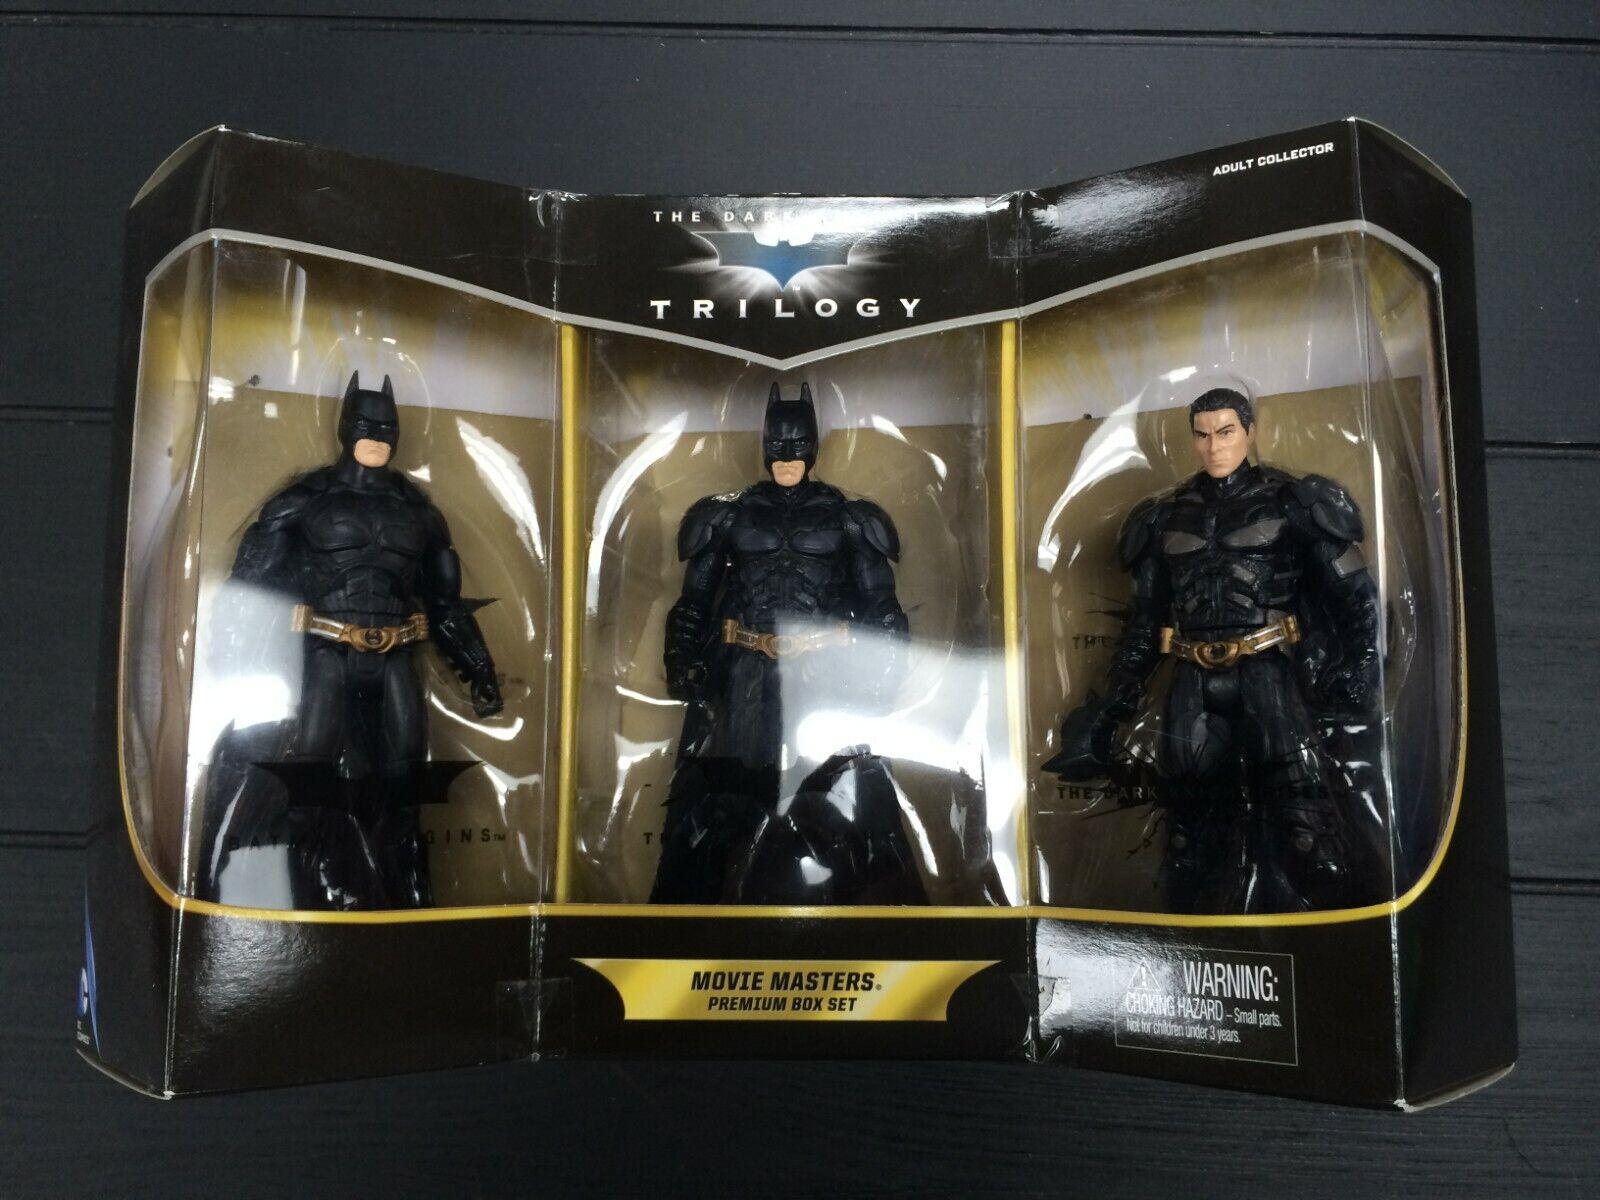 Batman Batman Batman the Dark Knight Trilogy Movie Masters Premium Box Set - 2013 - VGC Boxed f38b0e